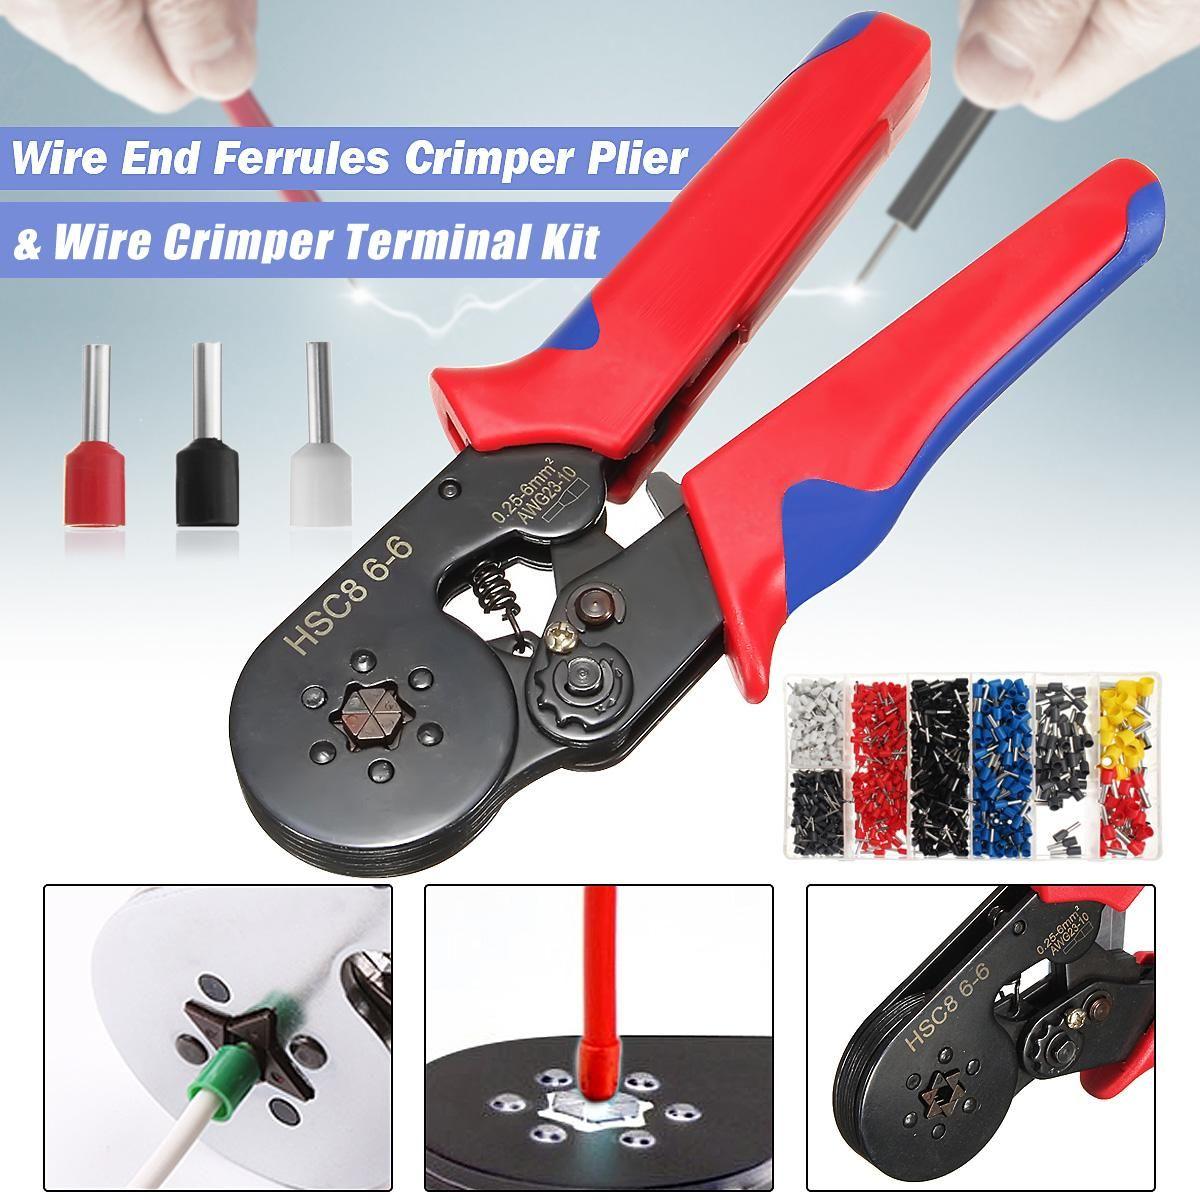 New Mini-Type Self-Adjustable Six Mandrel Ratchet Crimper Plier+1200Pcs Electrical Cable Wire End Terminal Connectors Crimping